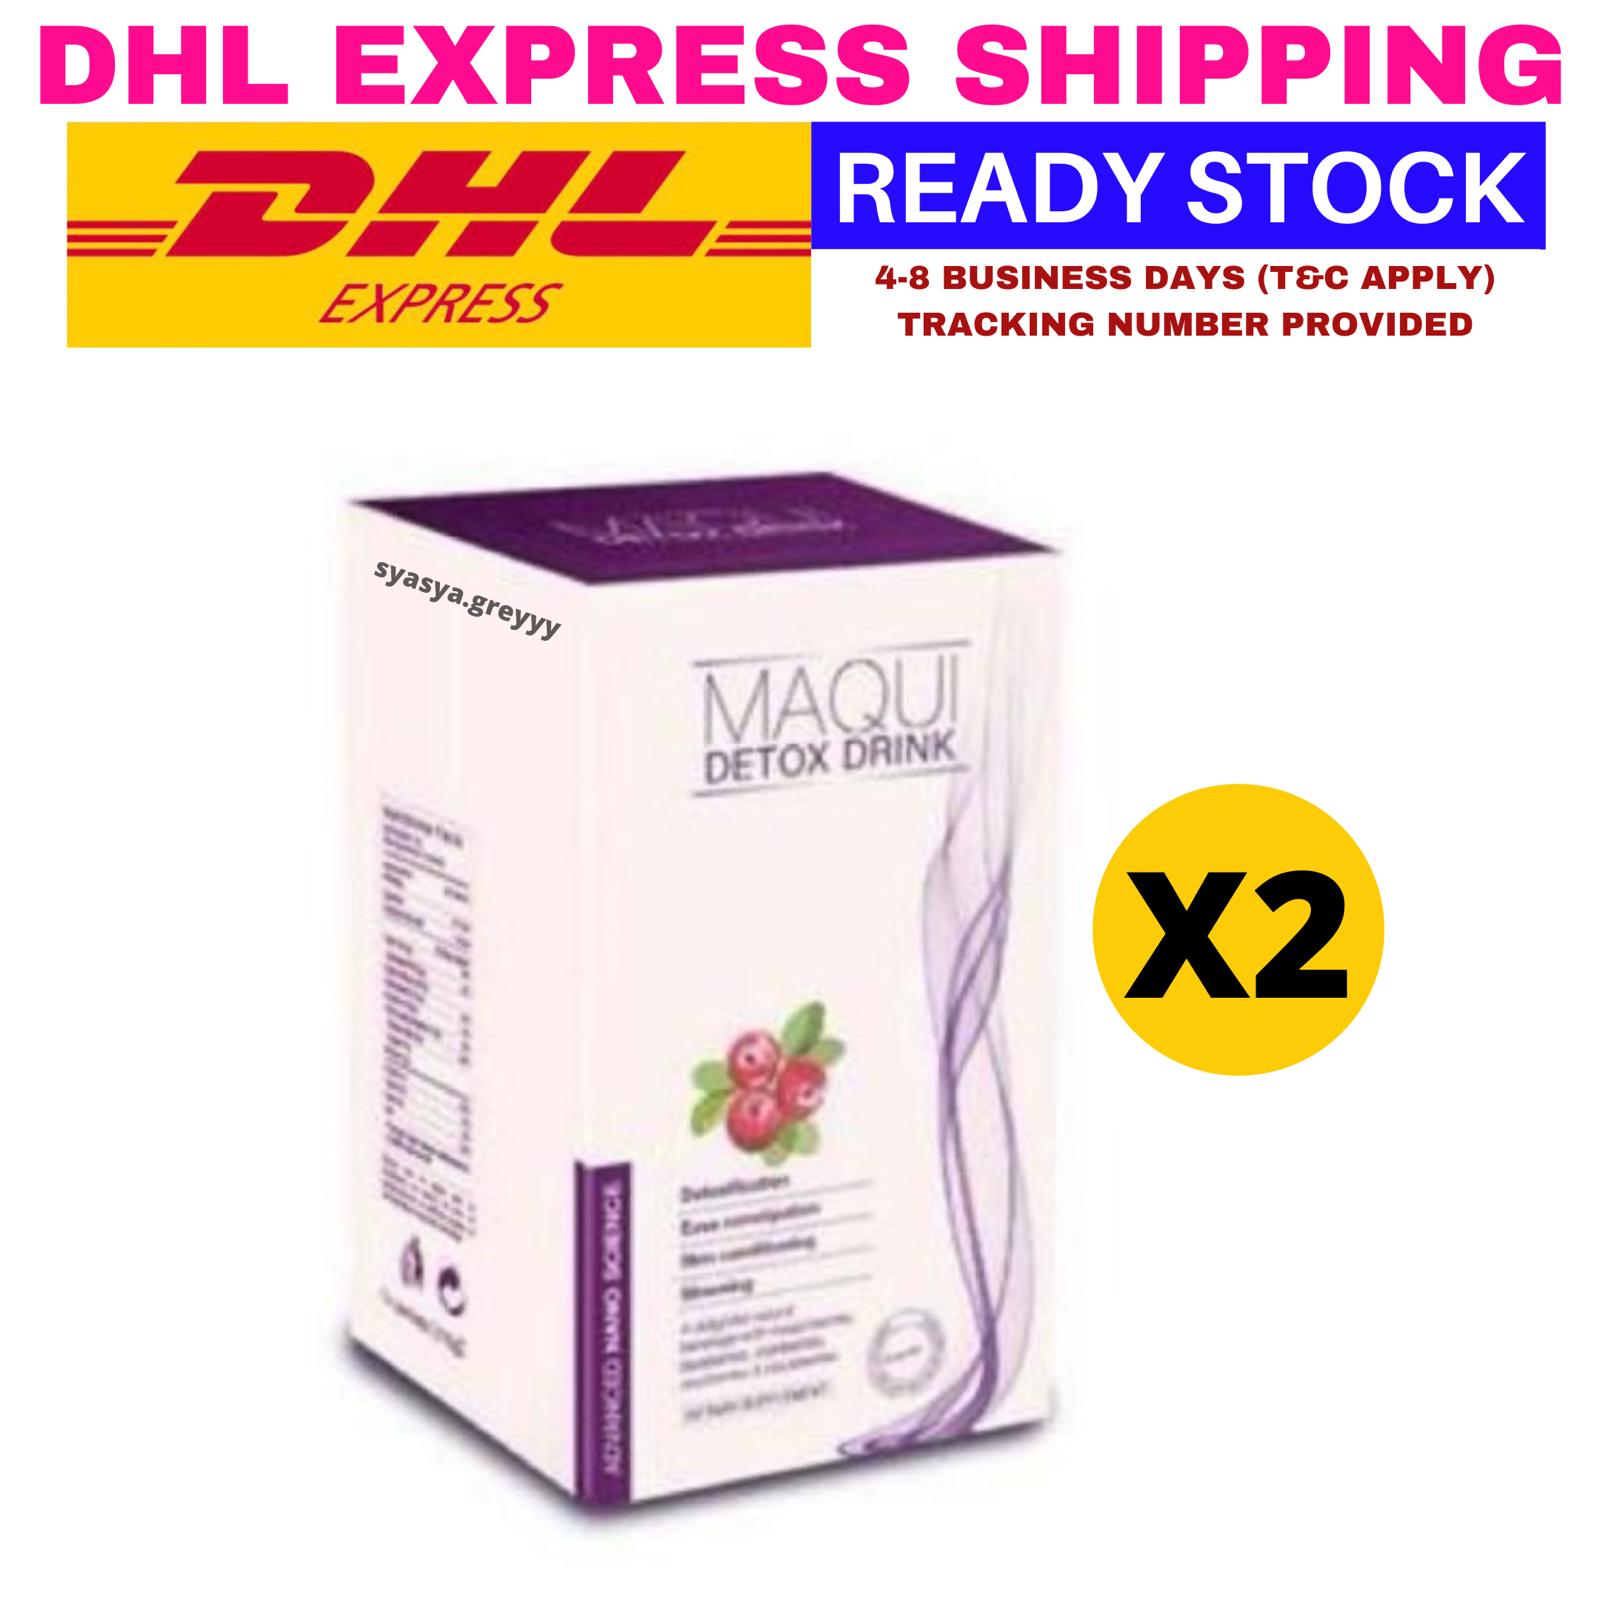 2 Boxes MAQUI DX / Detox Drink 100% Natural Berries Slimming Express - $72.27